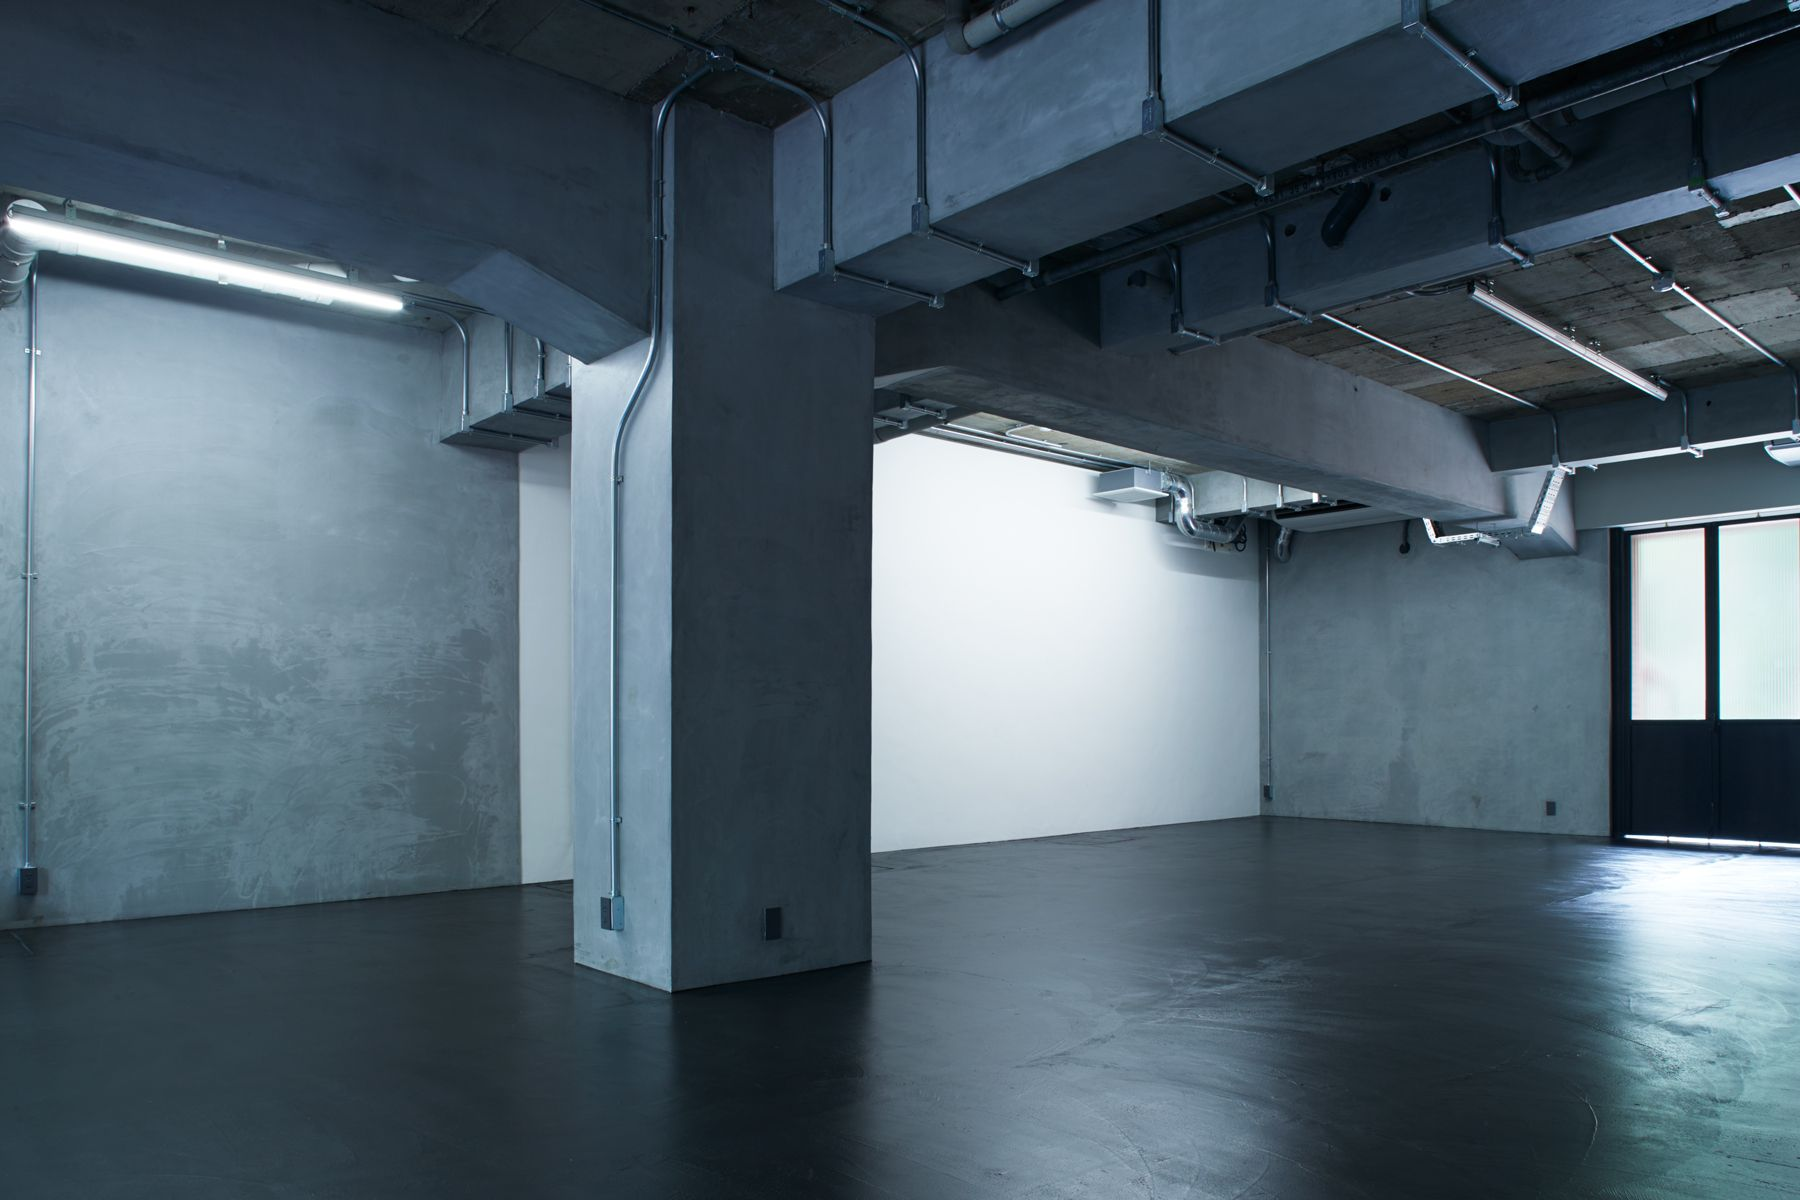 noru studio (ノル スタジオ)スタジオ内・白壁